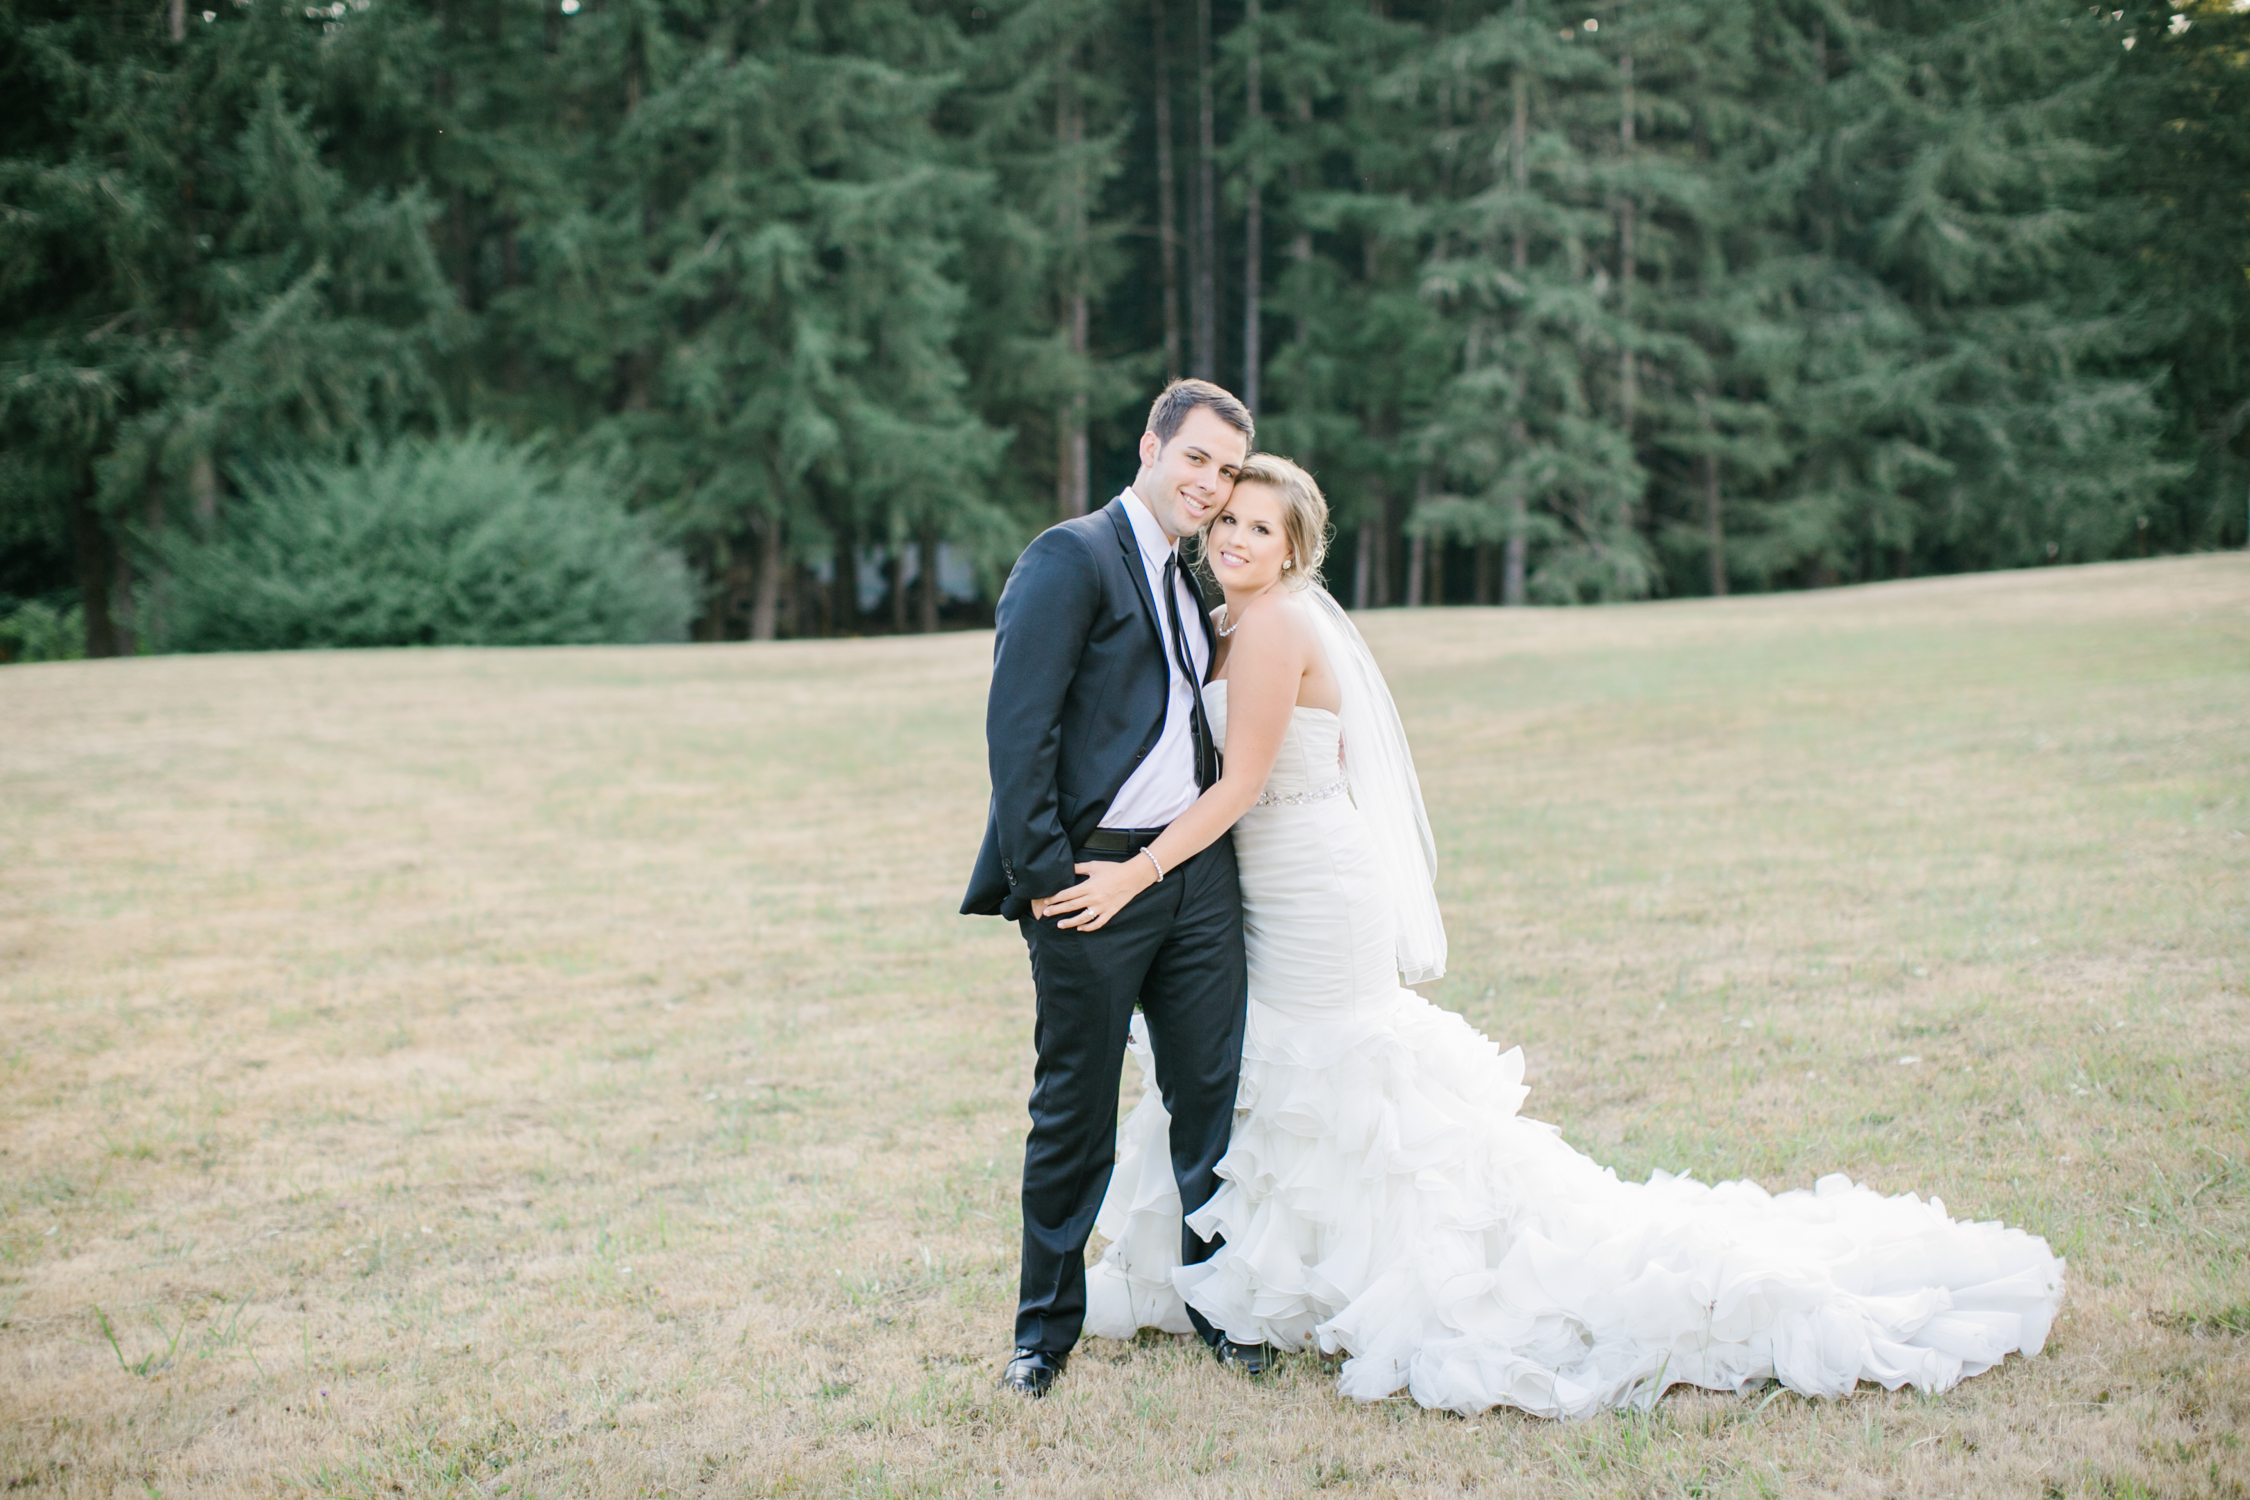 Oregon Barn Wedding by Michelle Cross-25.jpg